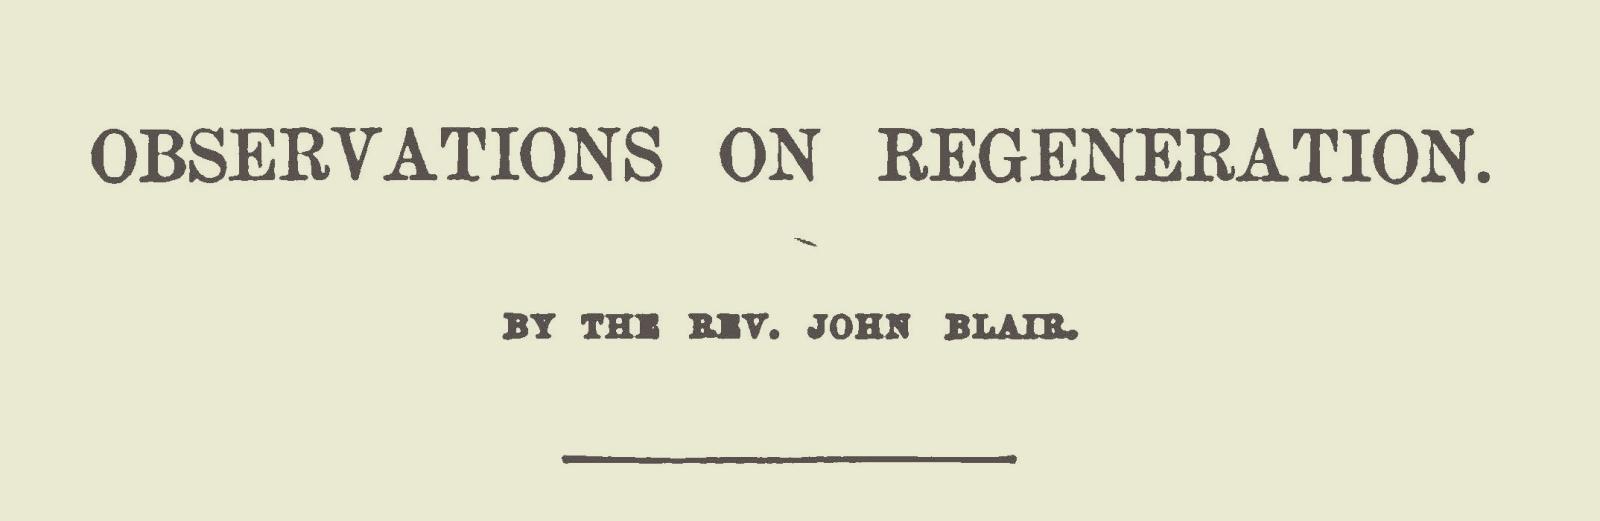 Blair, John, Observations on Regeneration Title Page.jpg